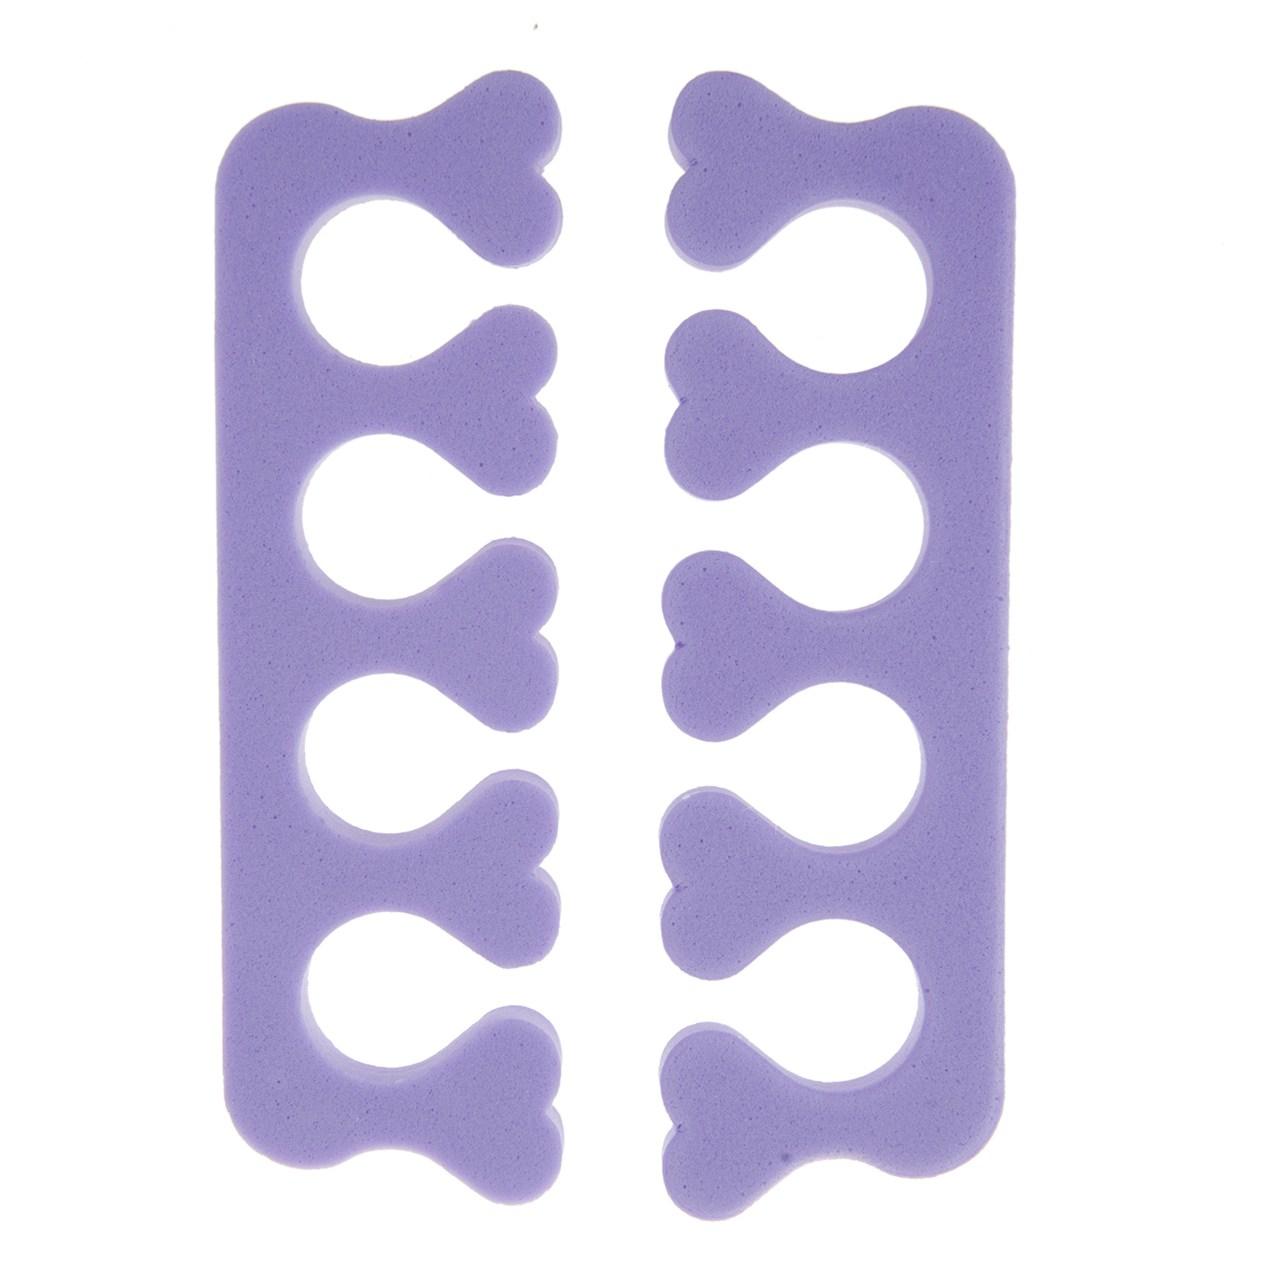 جدا کننده انگشت پا تریتون سری Toe Separator مدل PPT-03